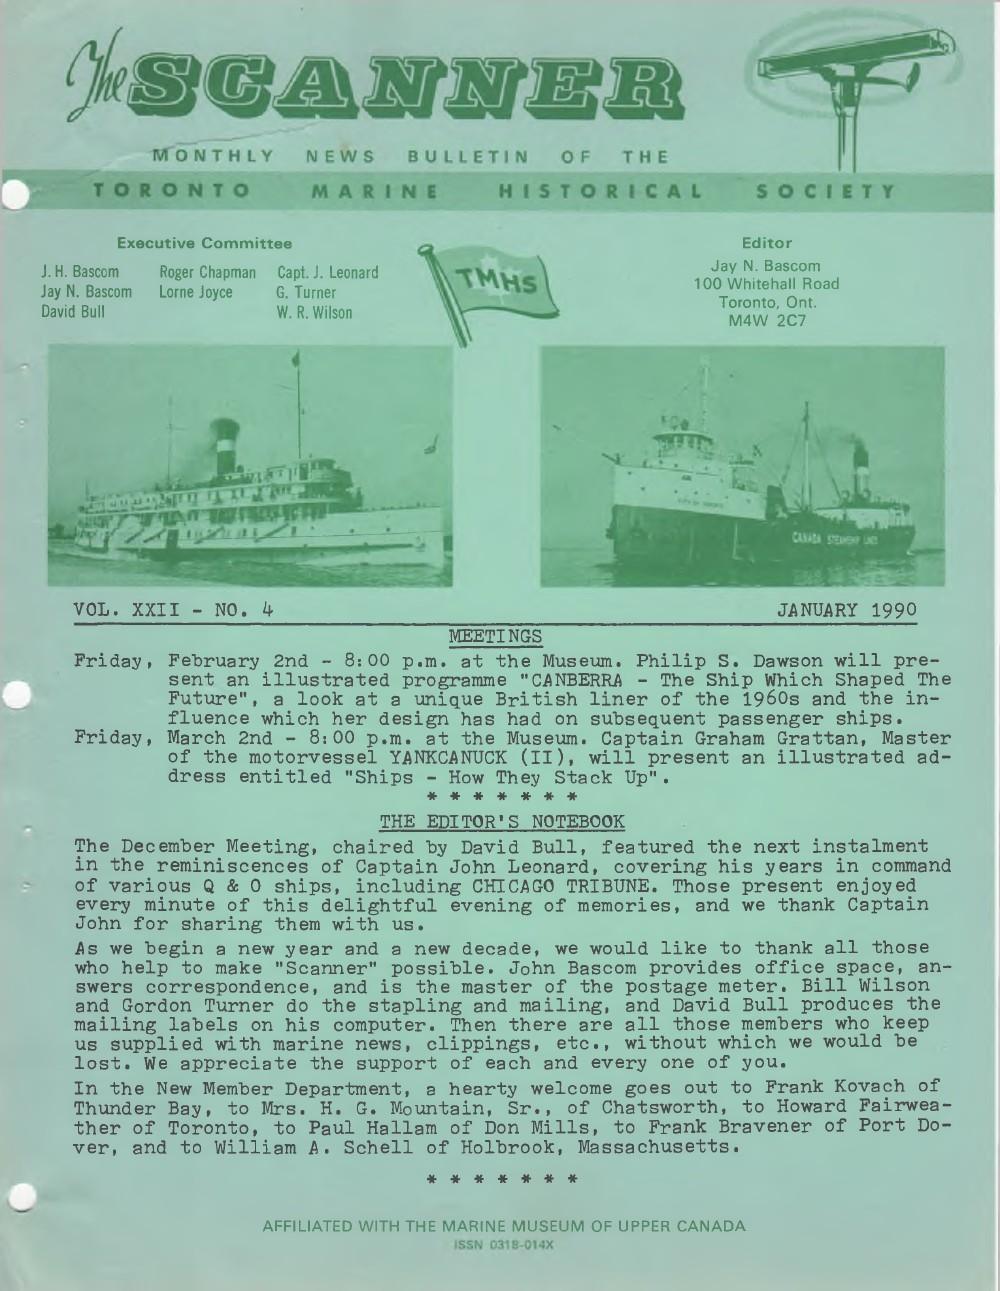 Scanner, v. 22, no. 4 (January 1990)